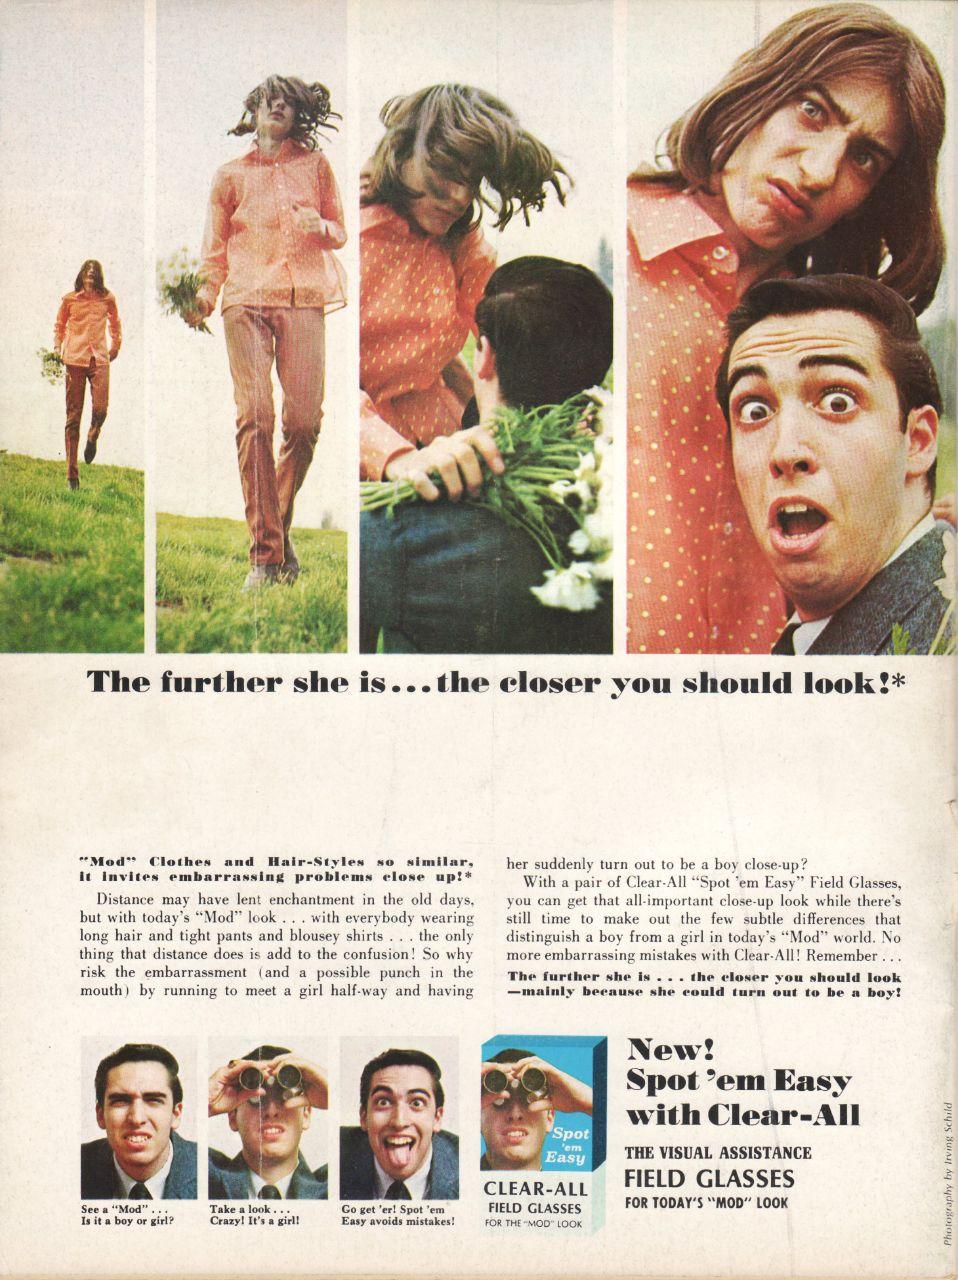 MAD Magazine March 1968